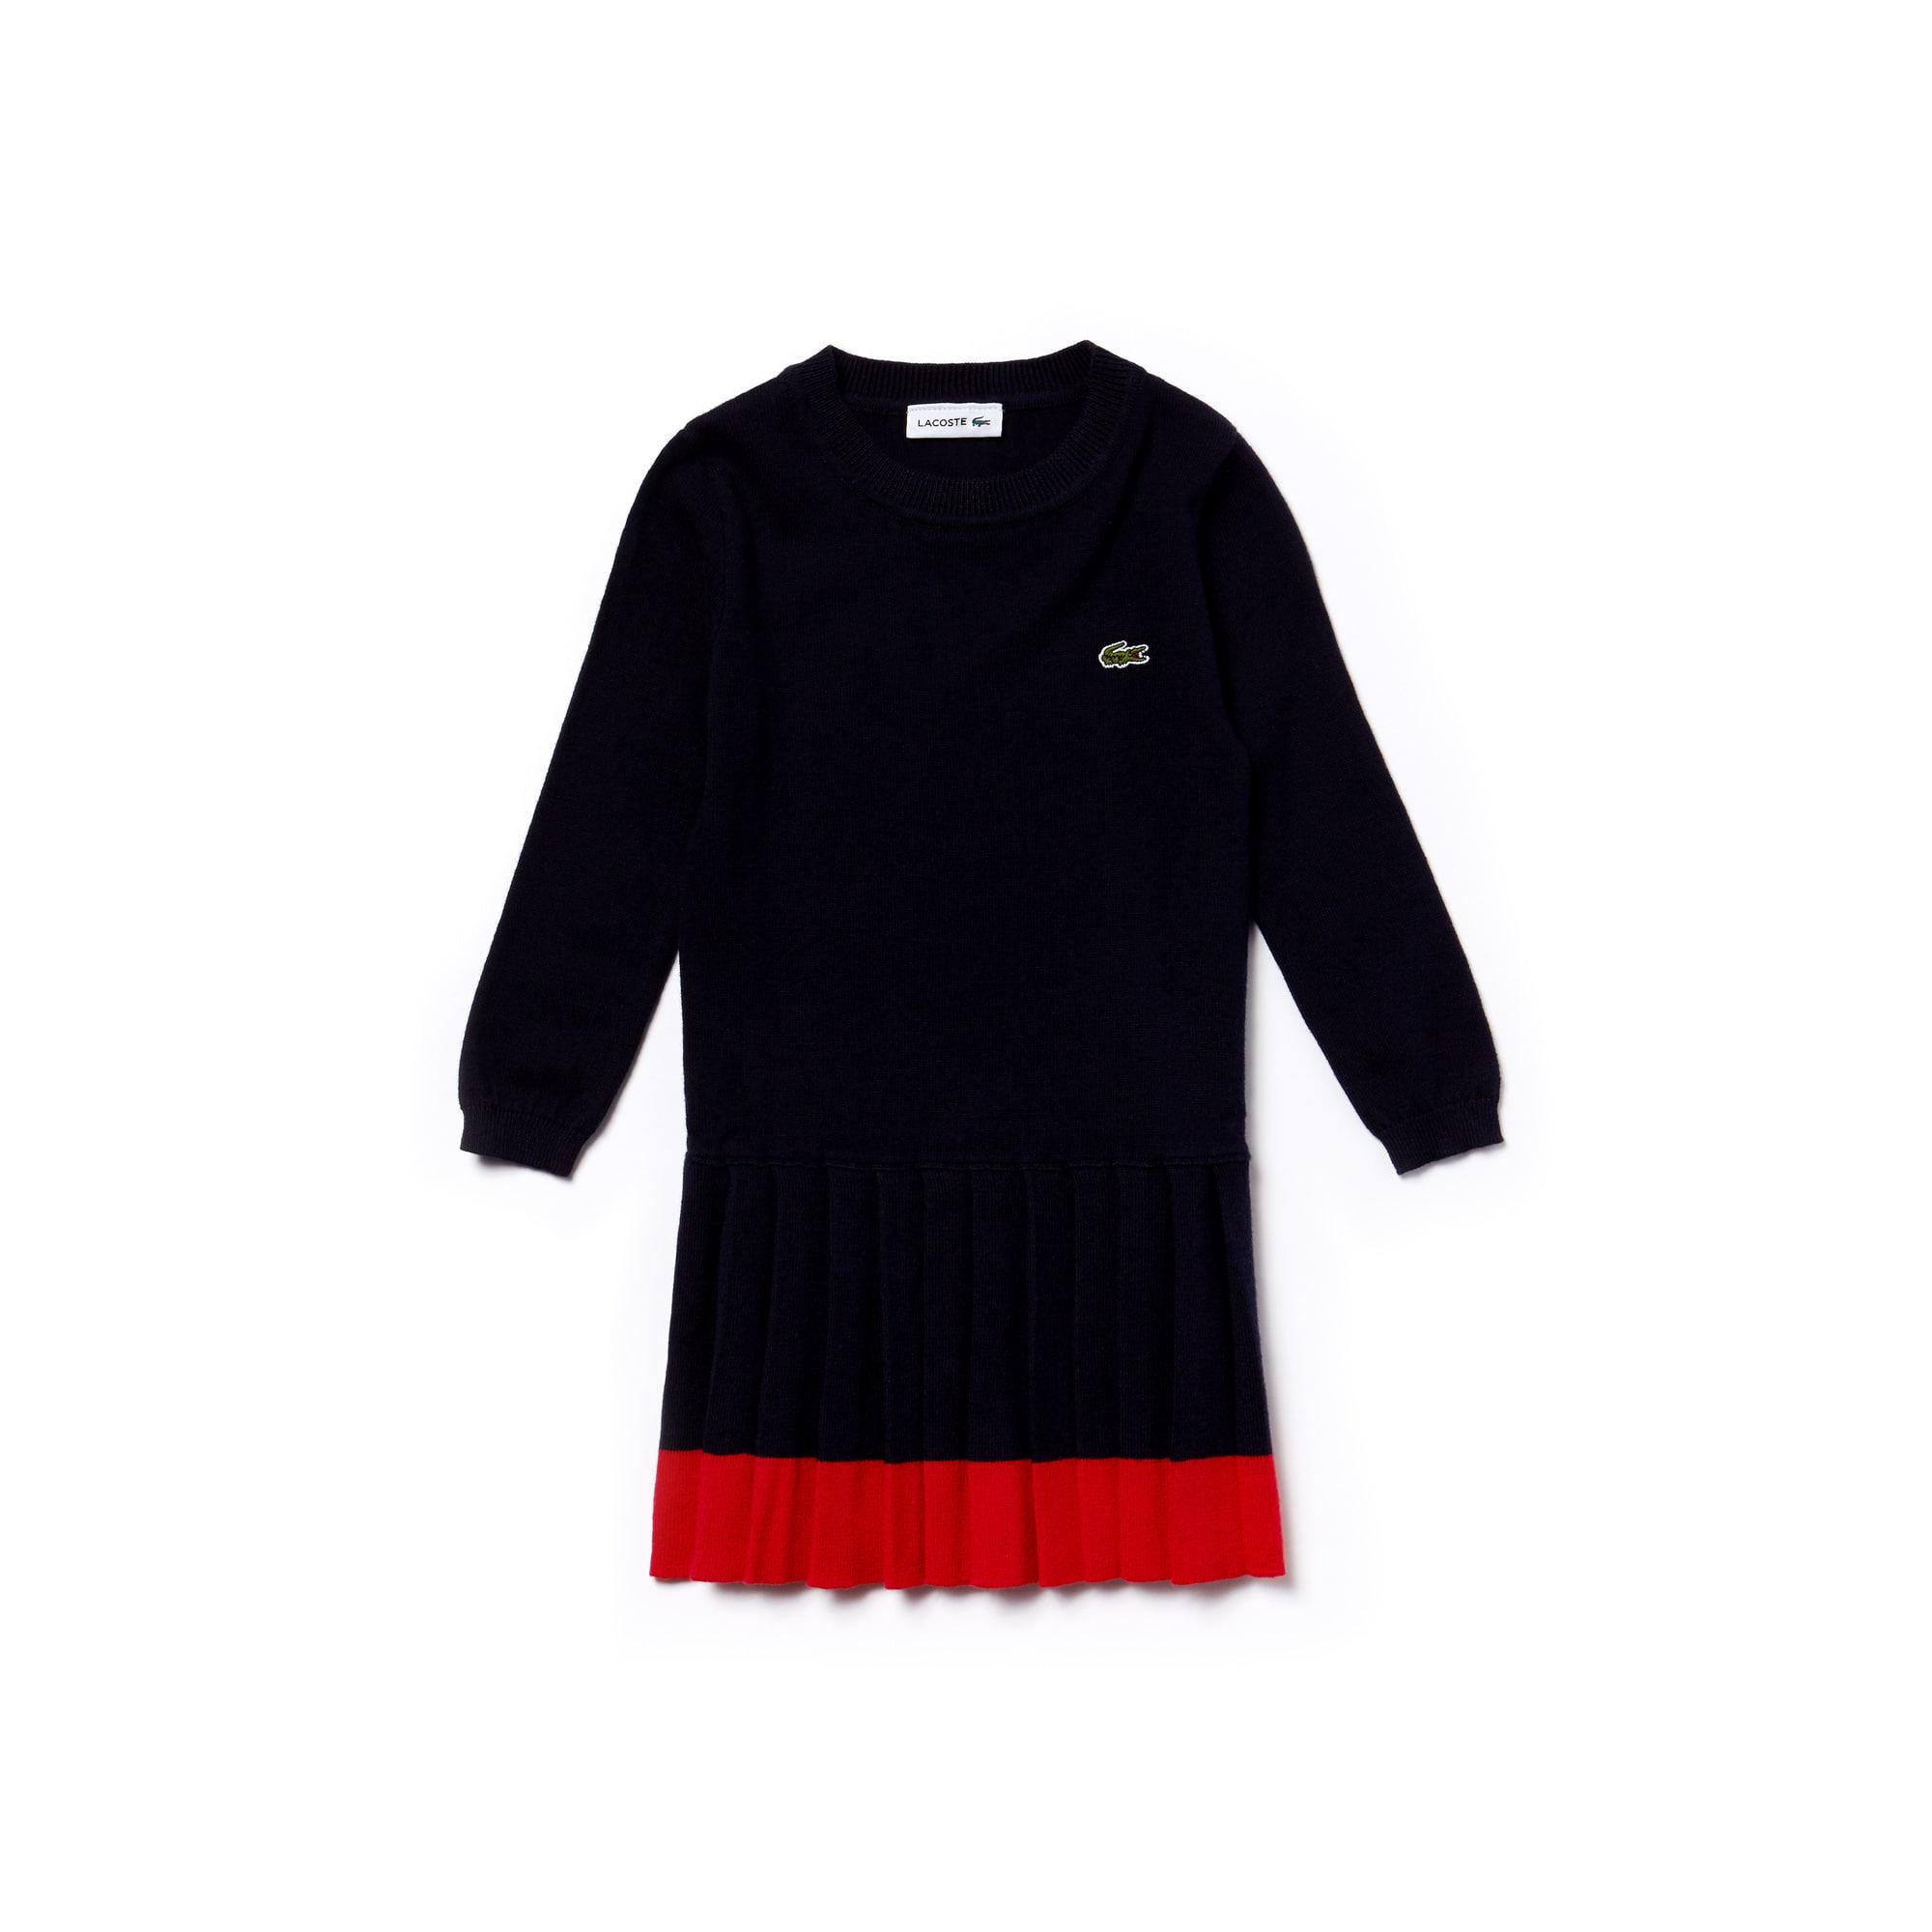 a75263c4826 Plissée En Robe Contrastée Sweatshirt Bande Fille Jersey Avec Lacoste x1wF4w